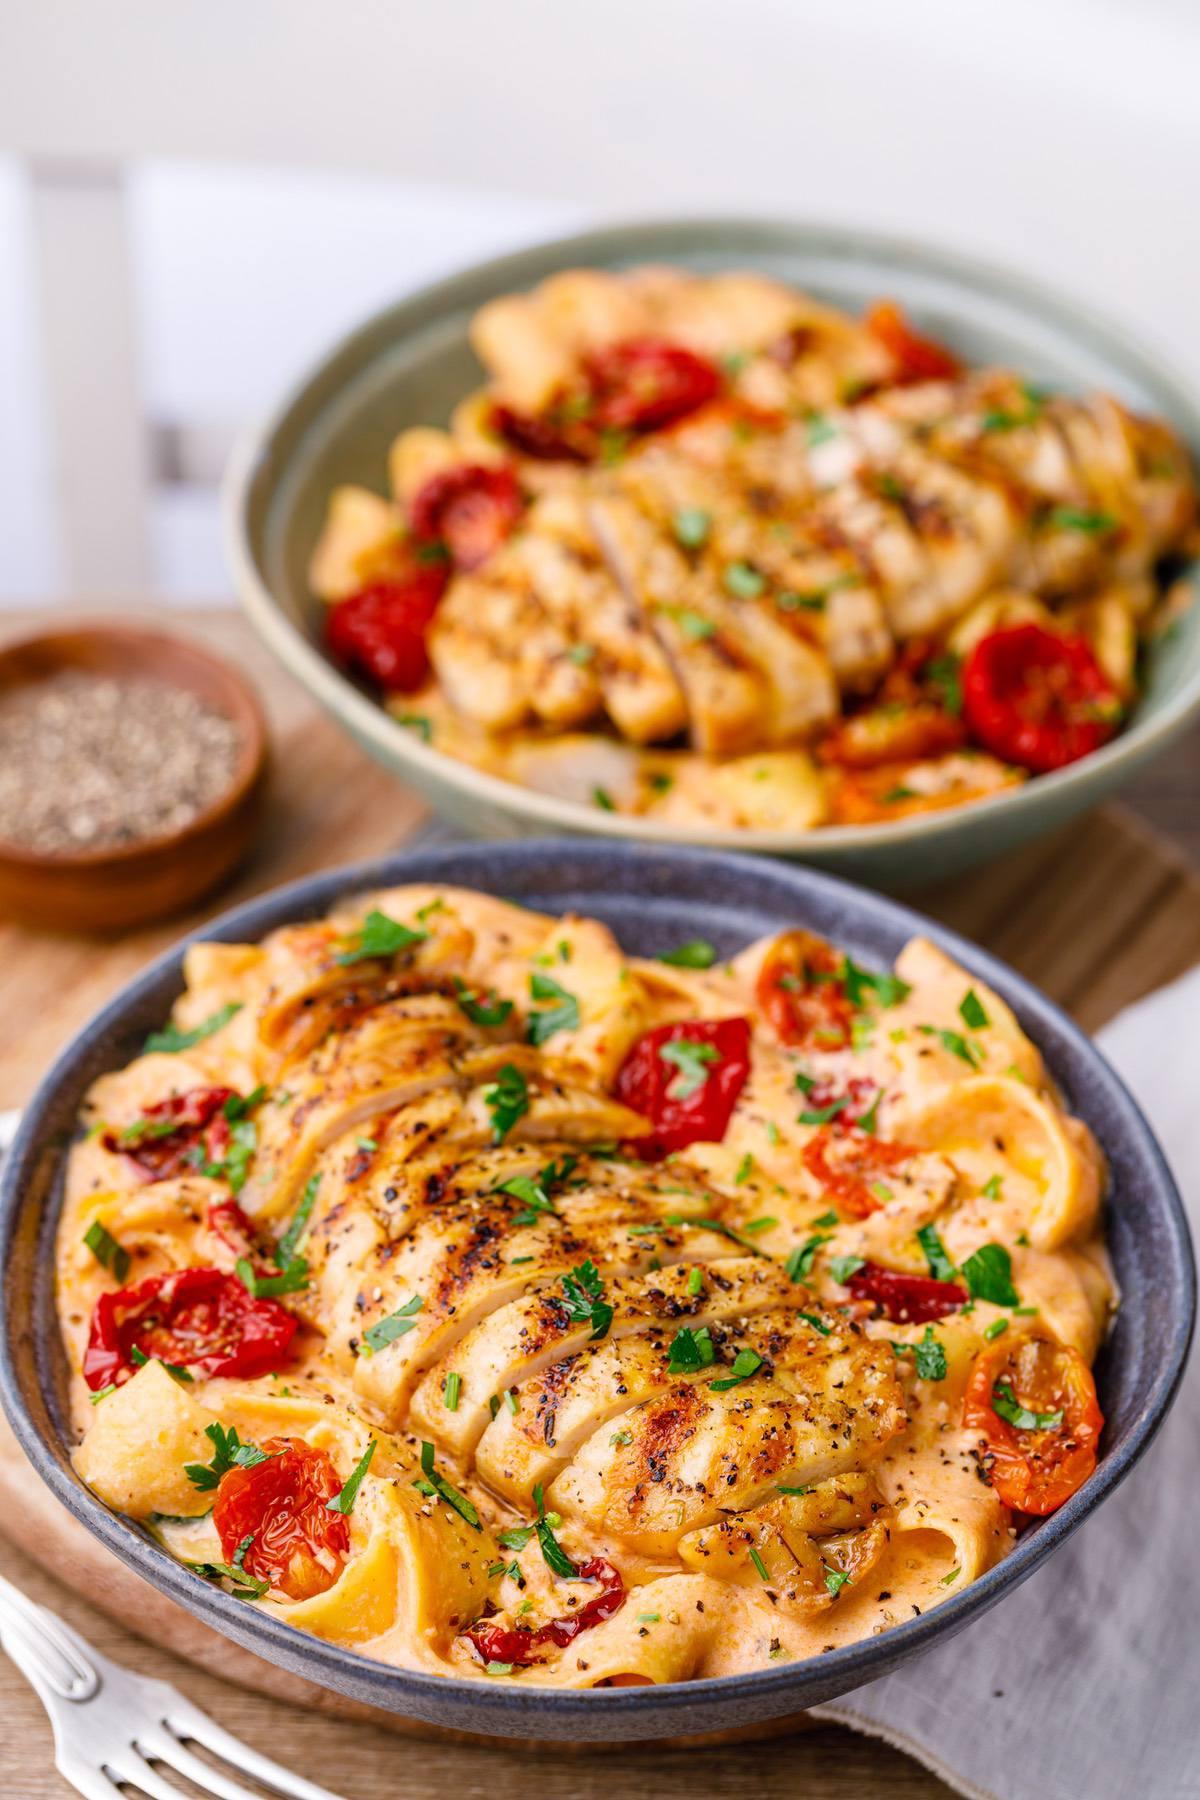 Sun Dried Tomato Pasta With Chicken